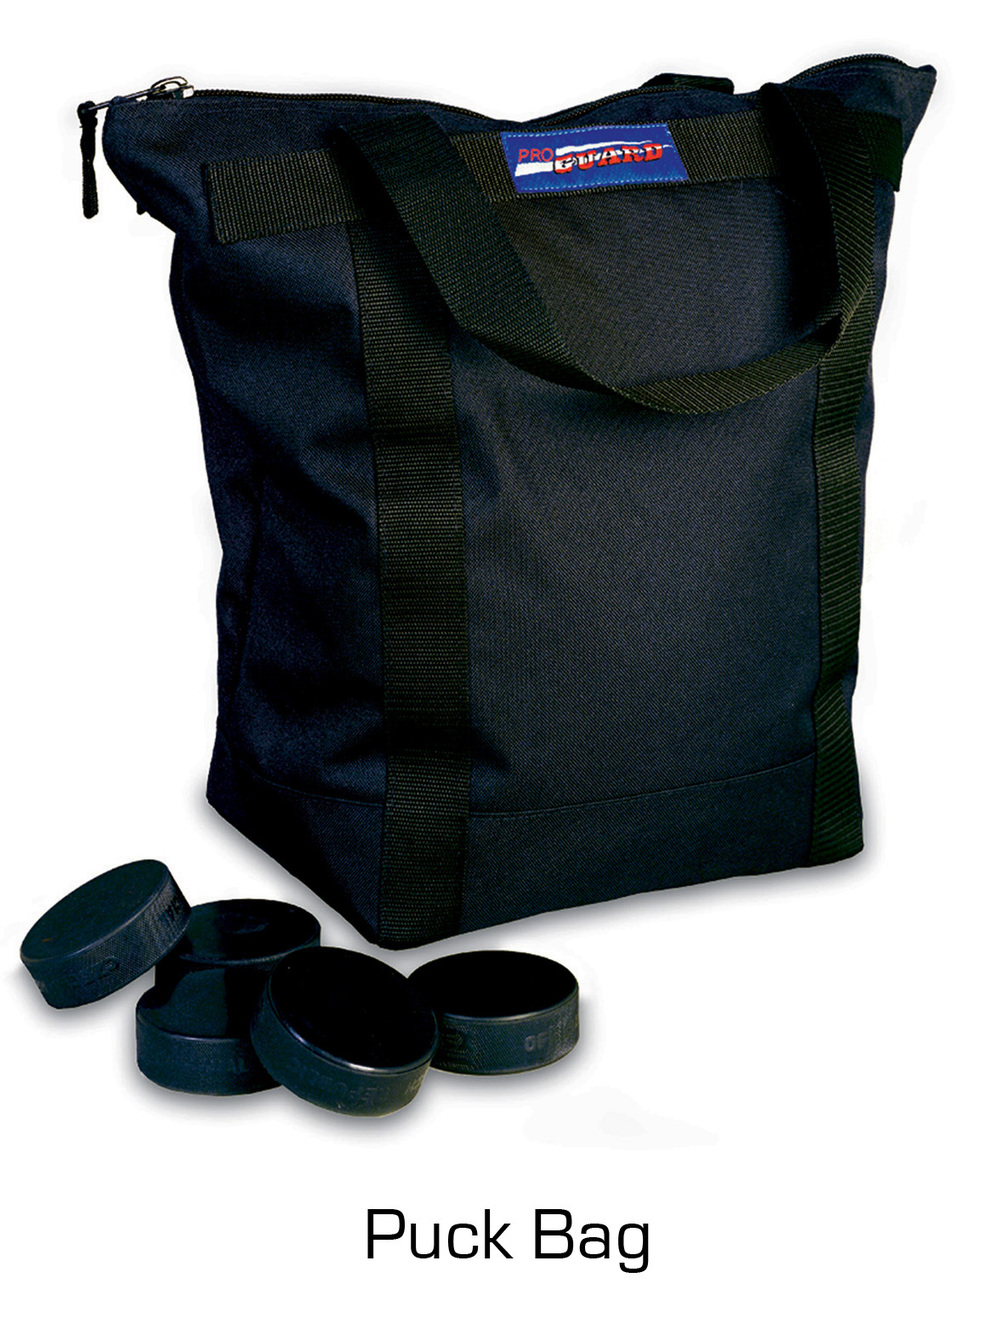 Puck Bag